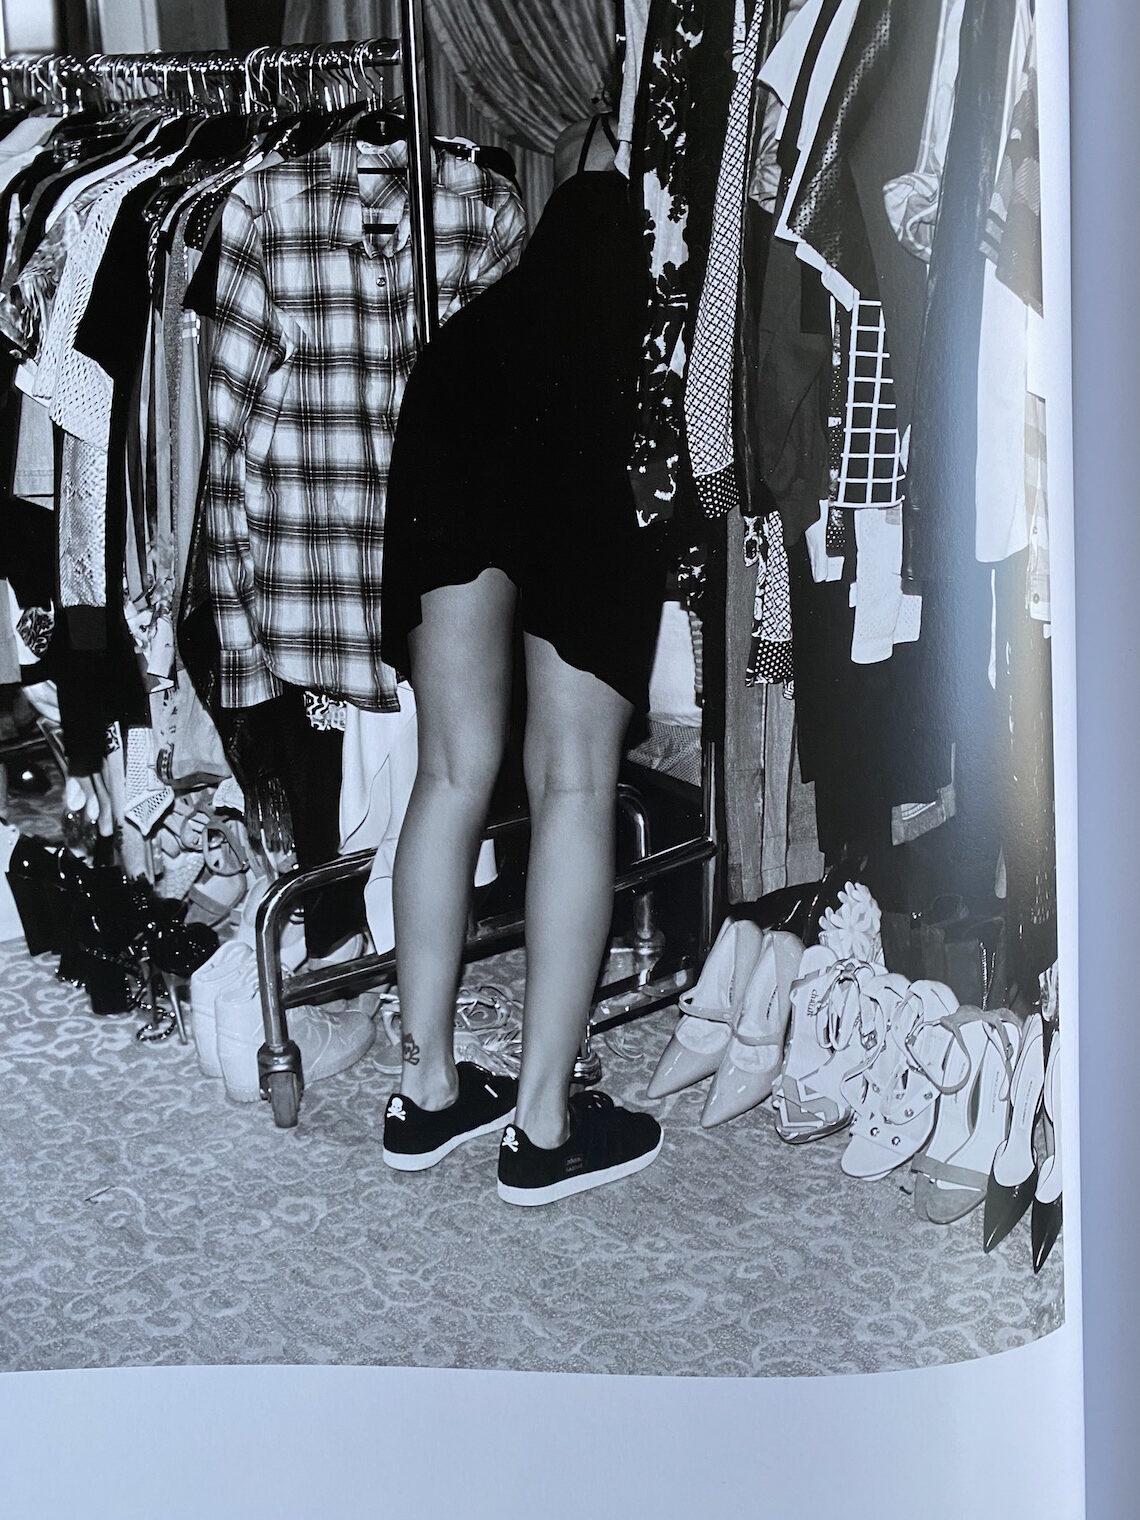 rihanna book-clothes-fashion-favorite things about rihanna